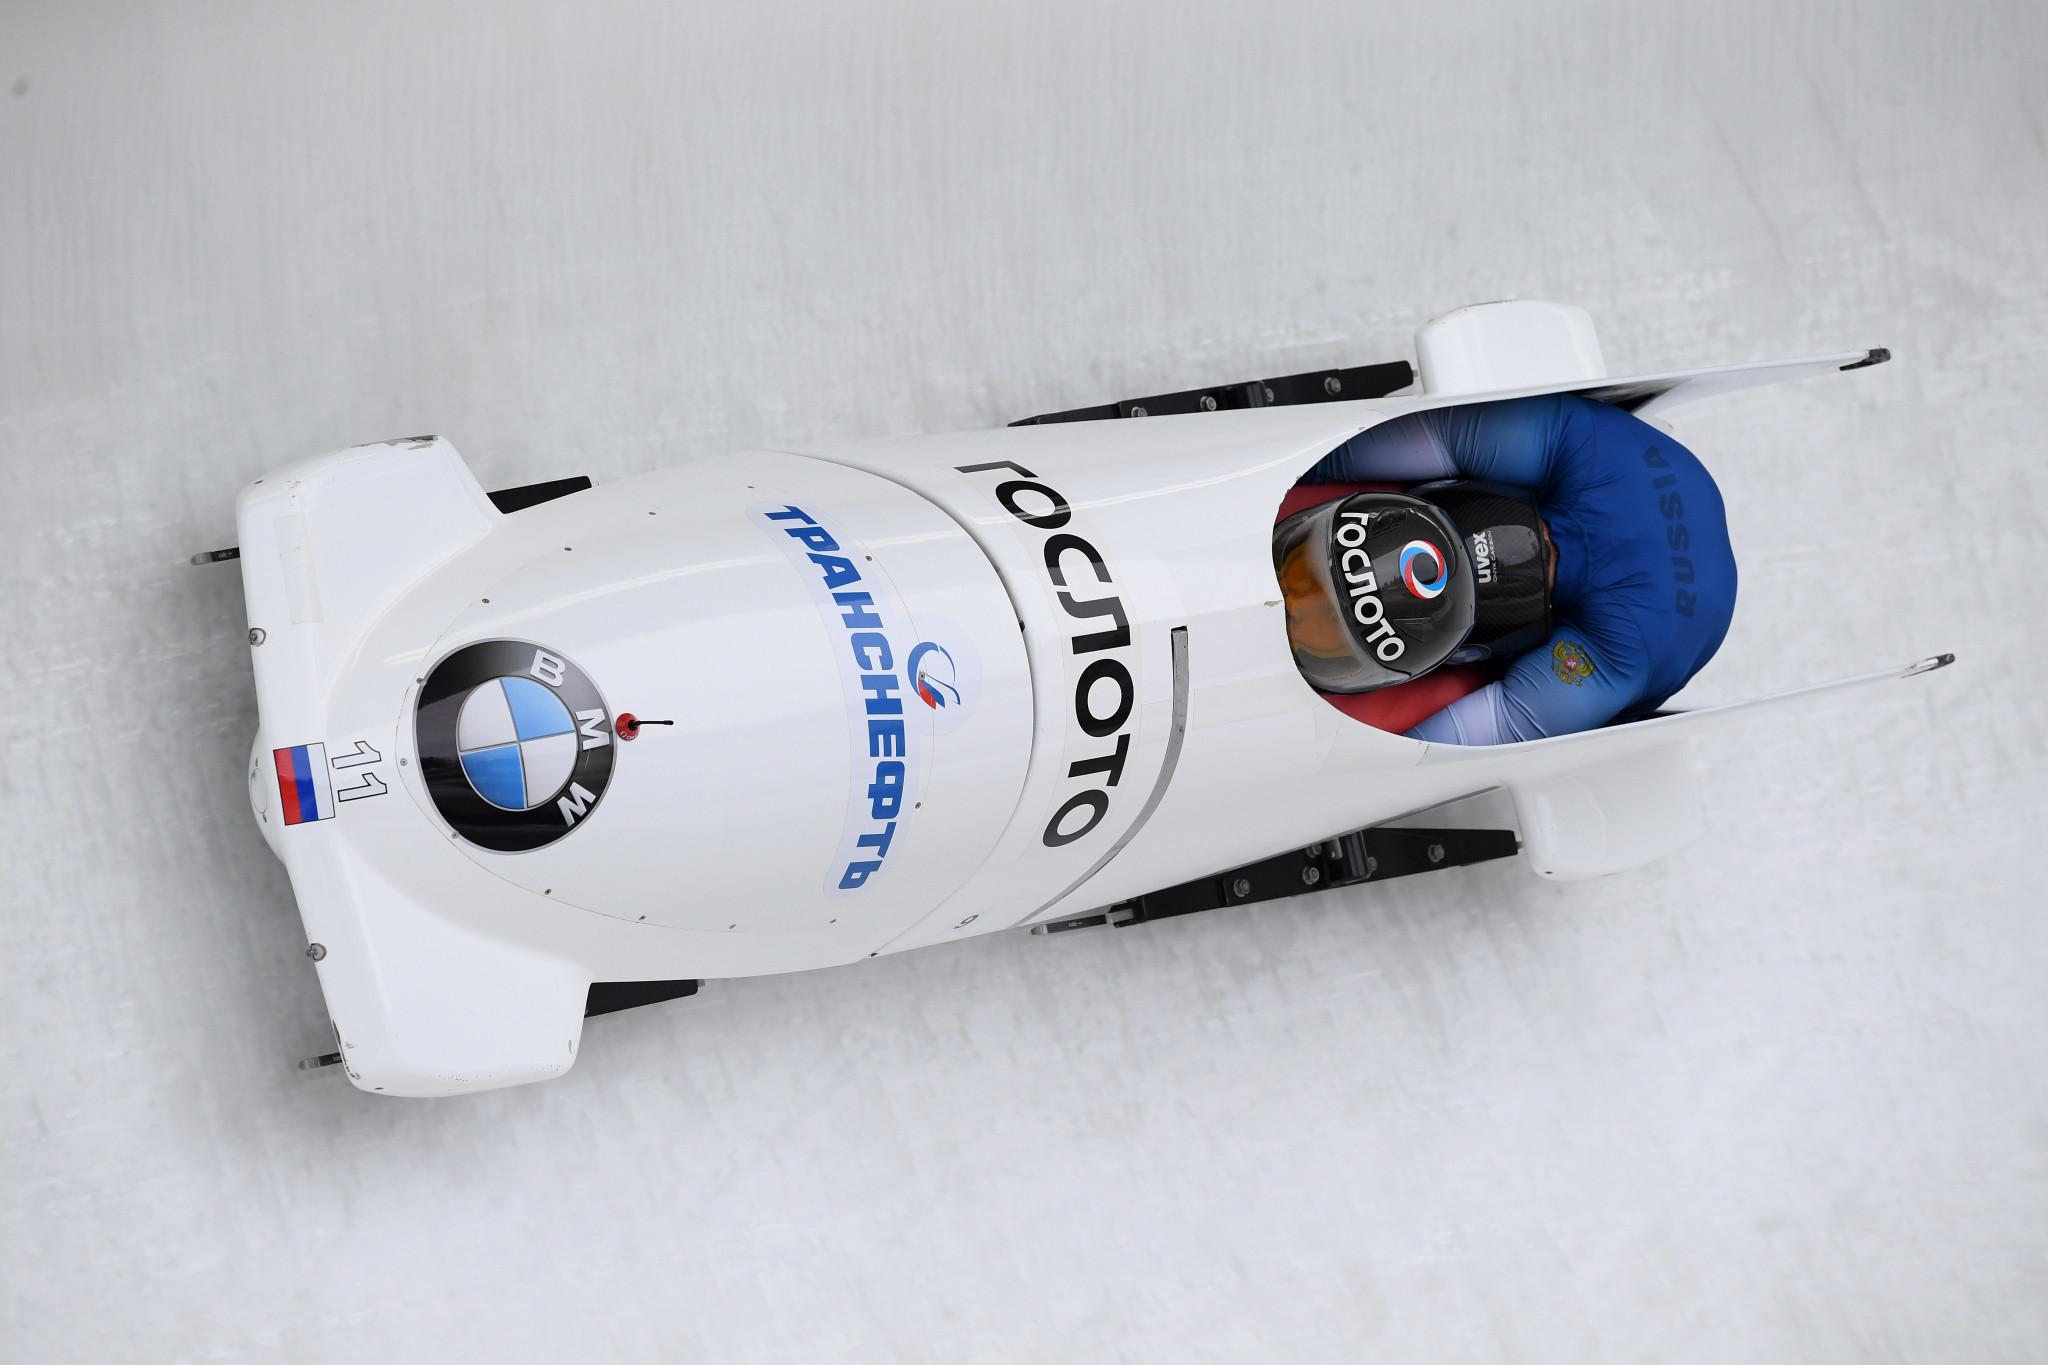 IOC confirm Belugin banned following Sochi 2014 re-test